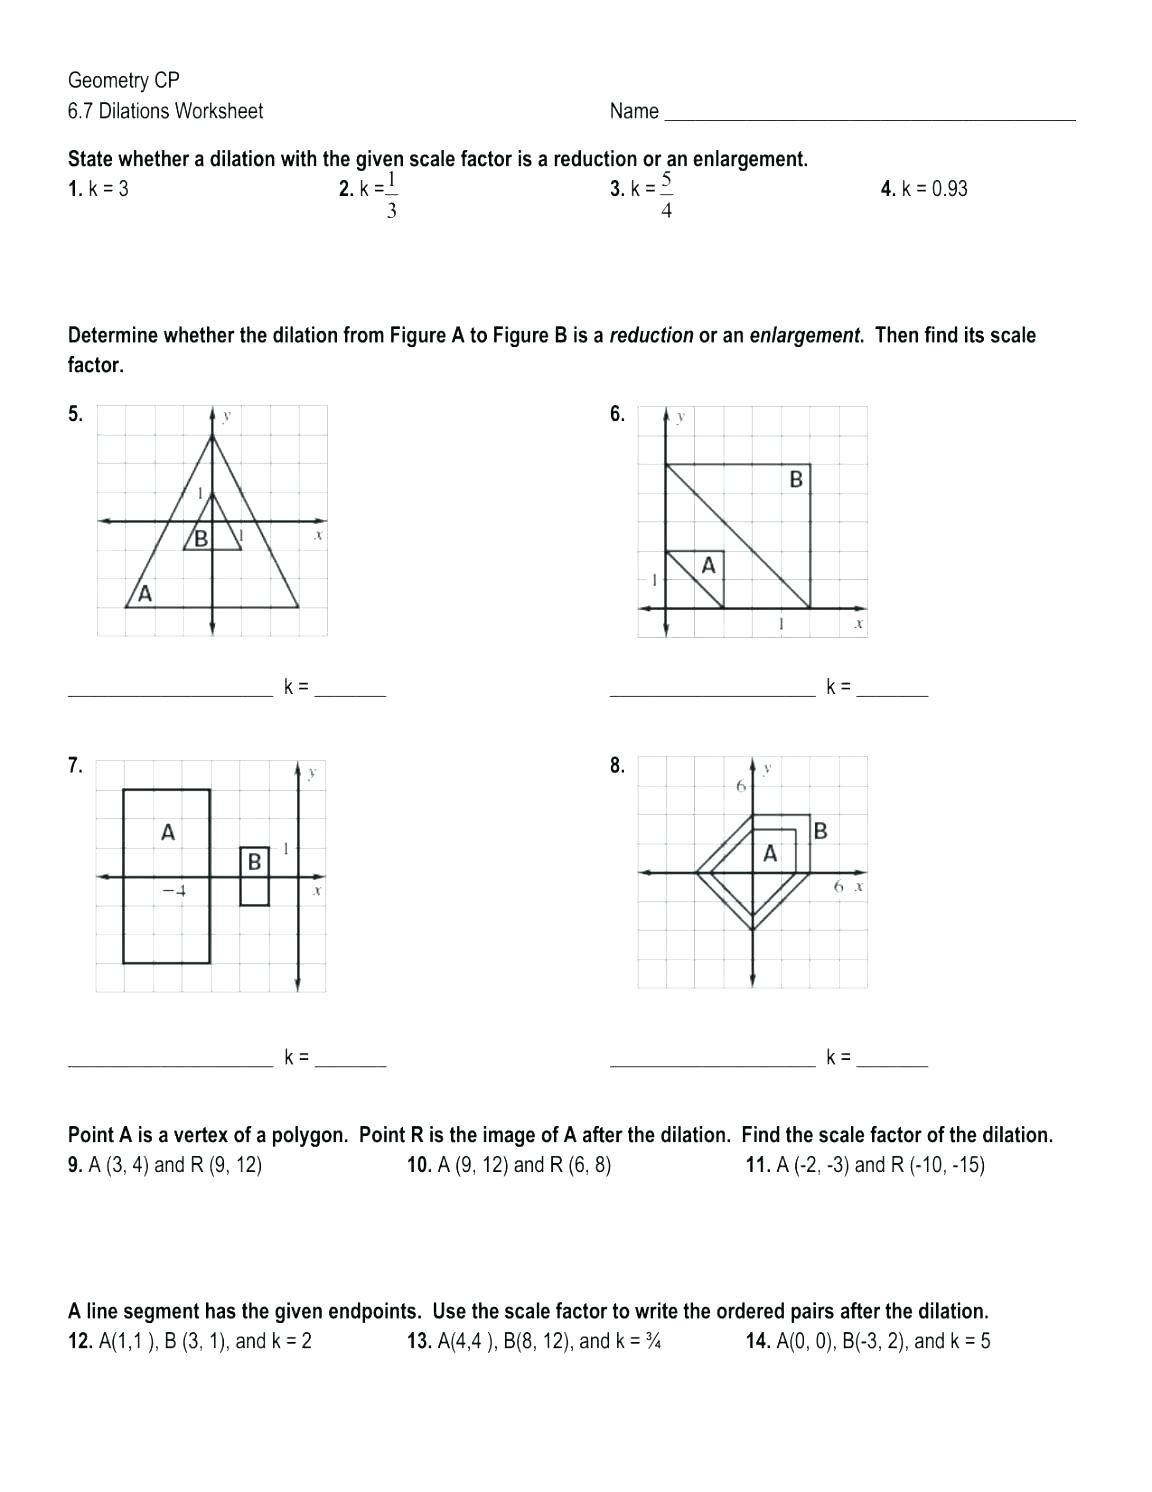 Line Segment Worksheets For 3rd Grade Redbirdcolorco